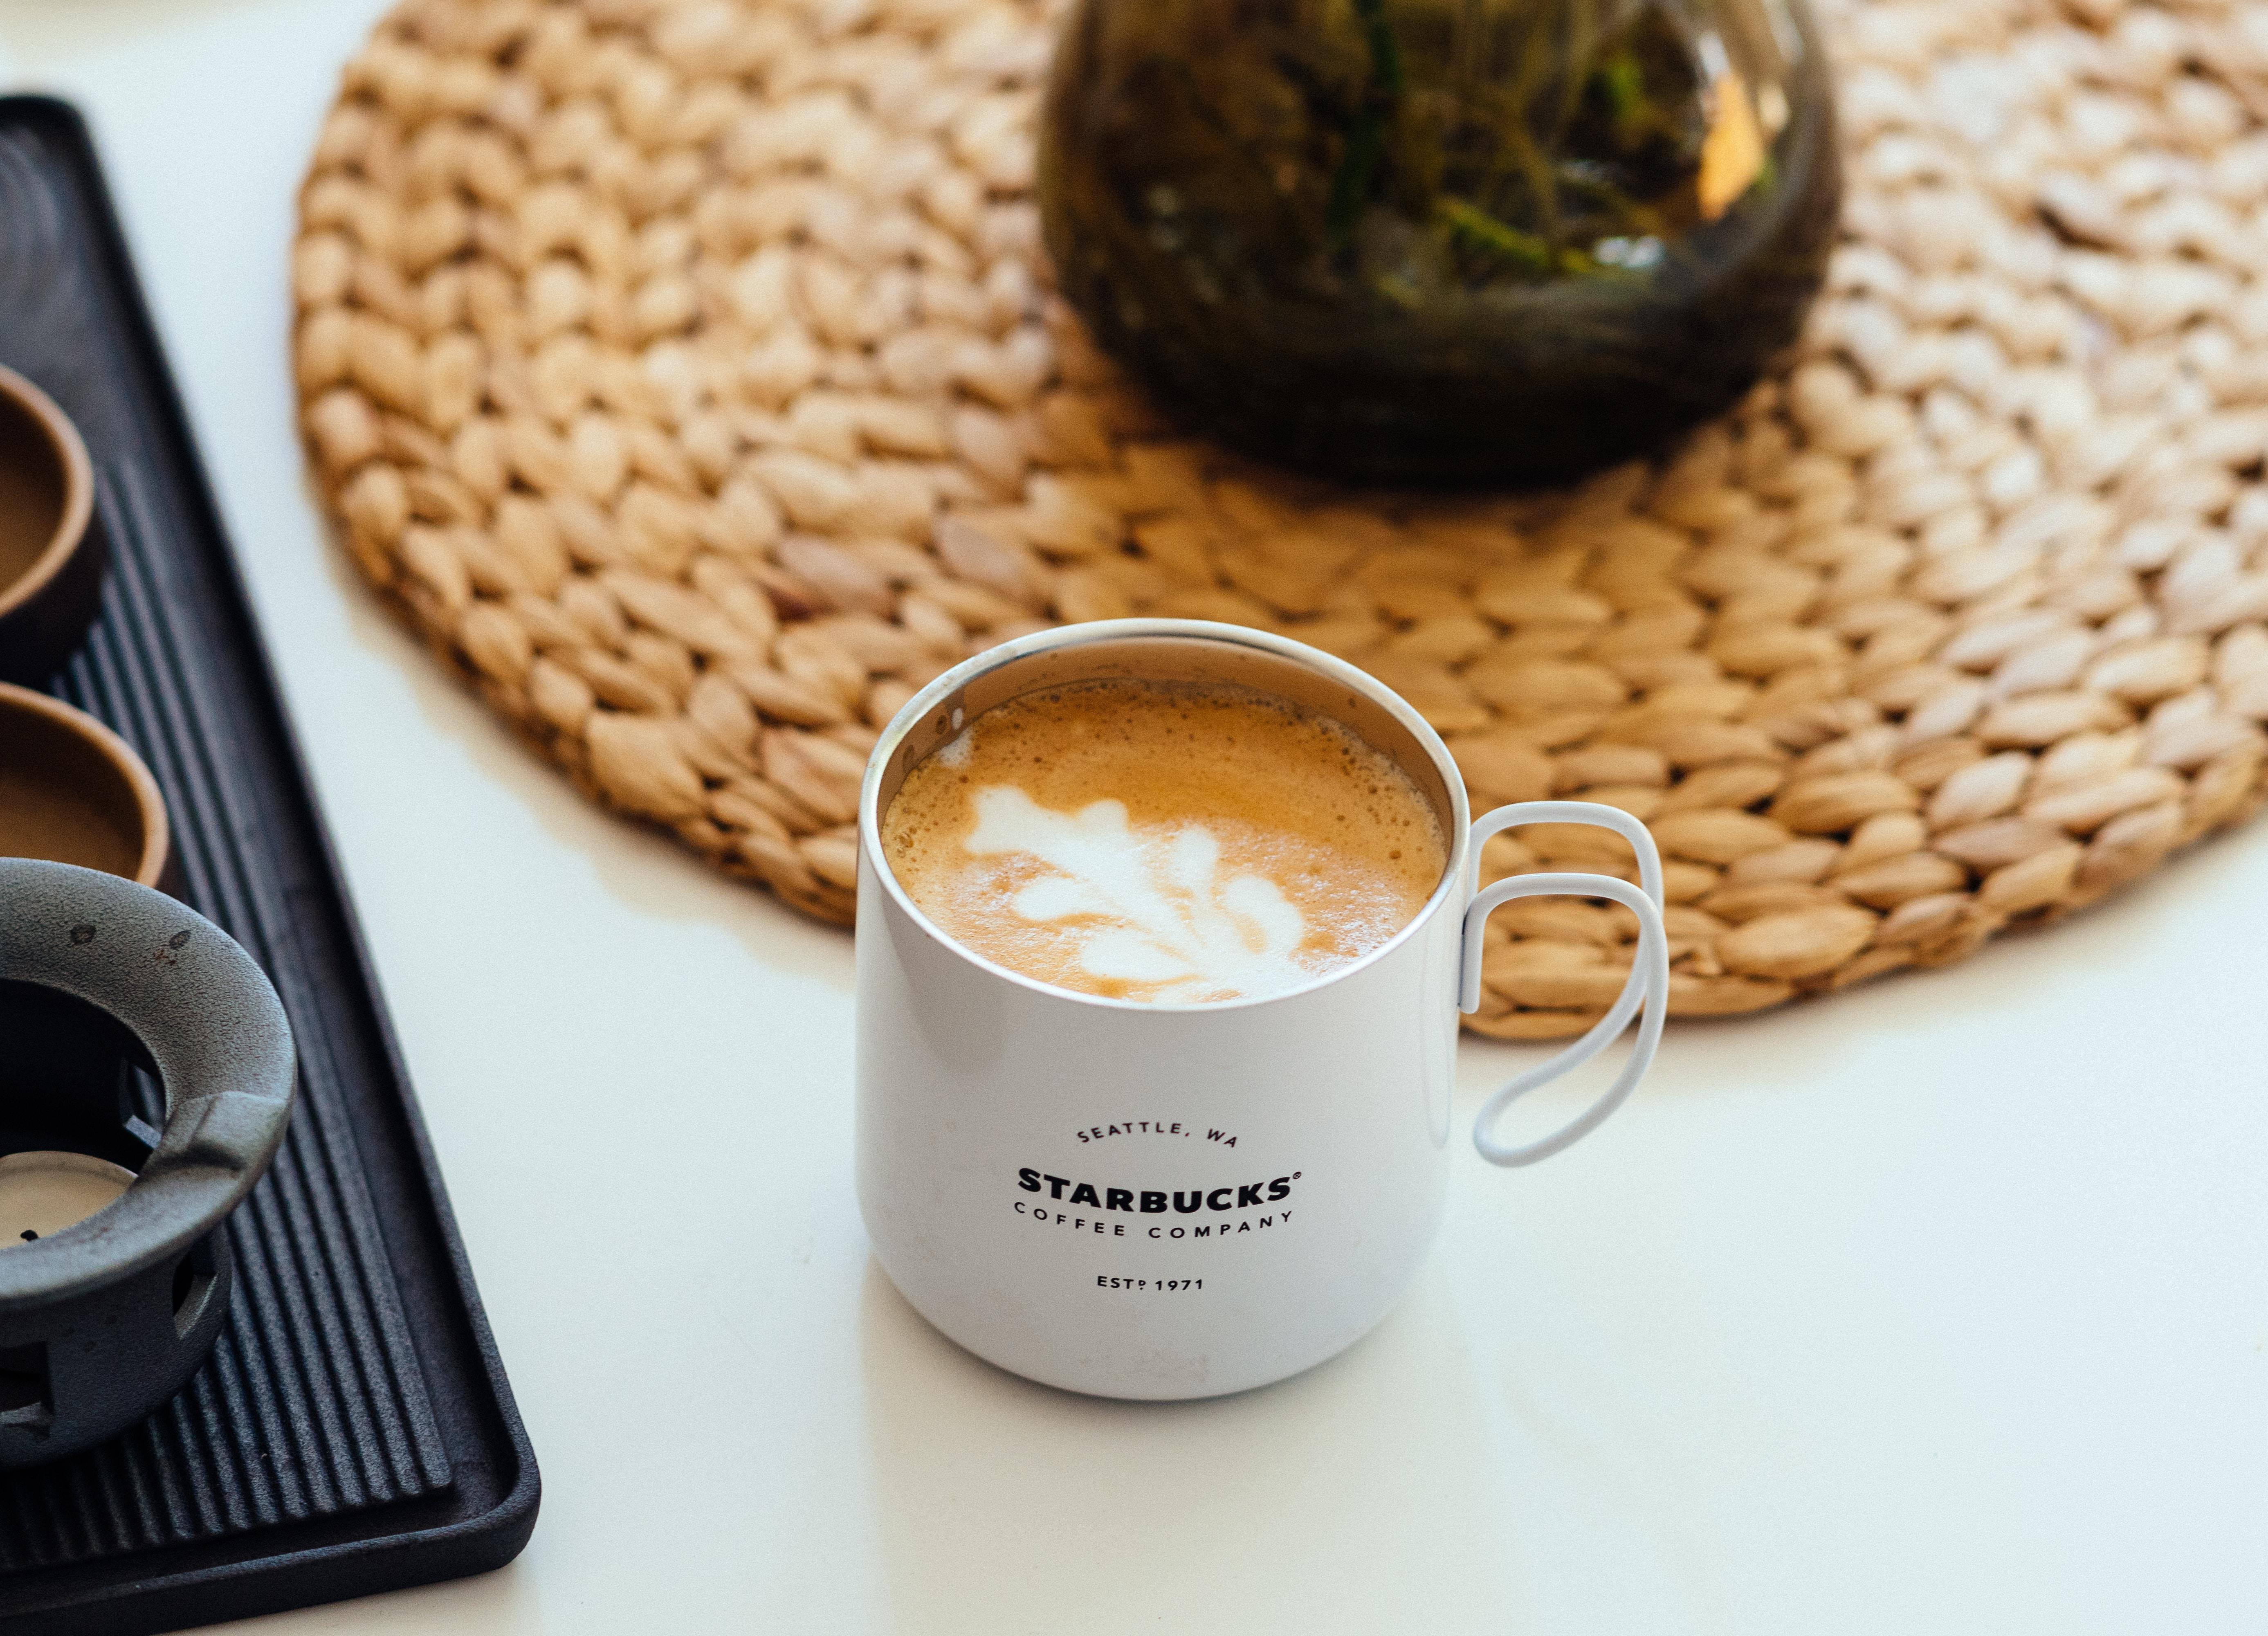 cappuccino in white starbucks mug